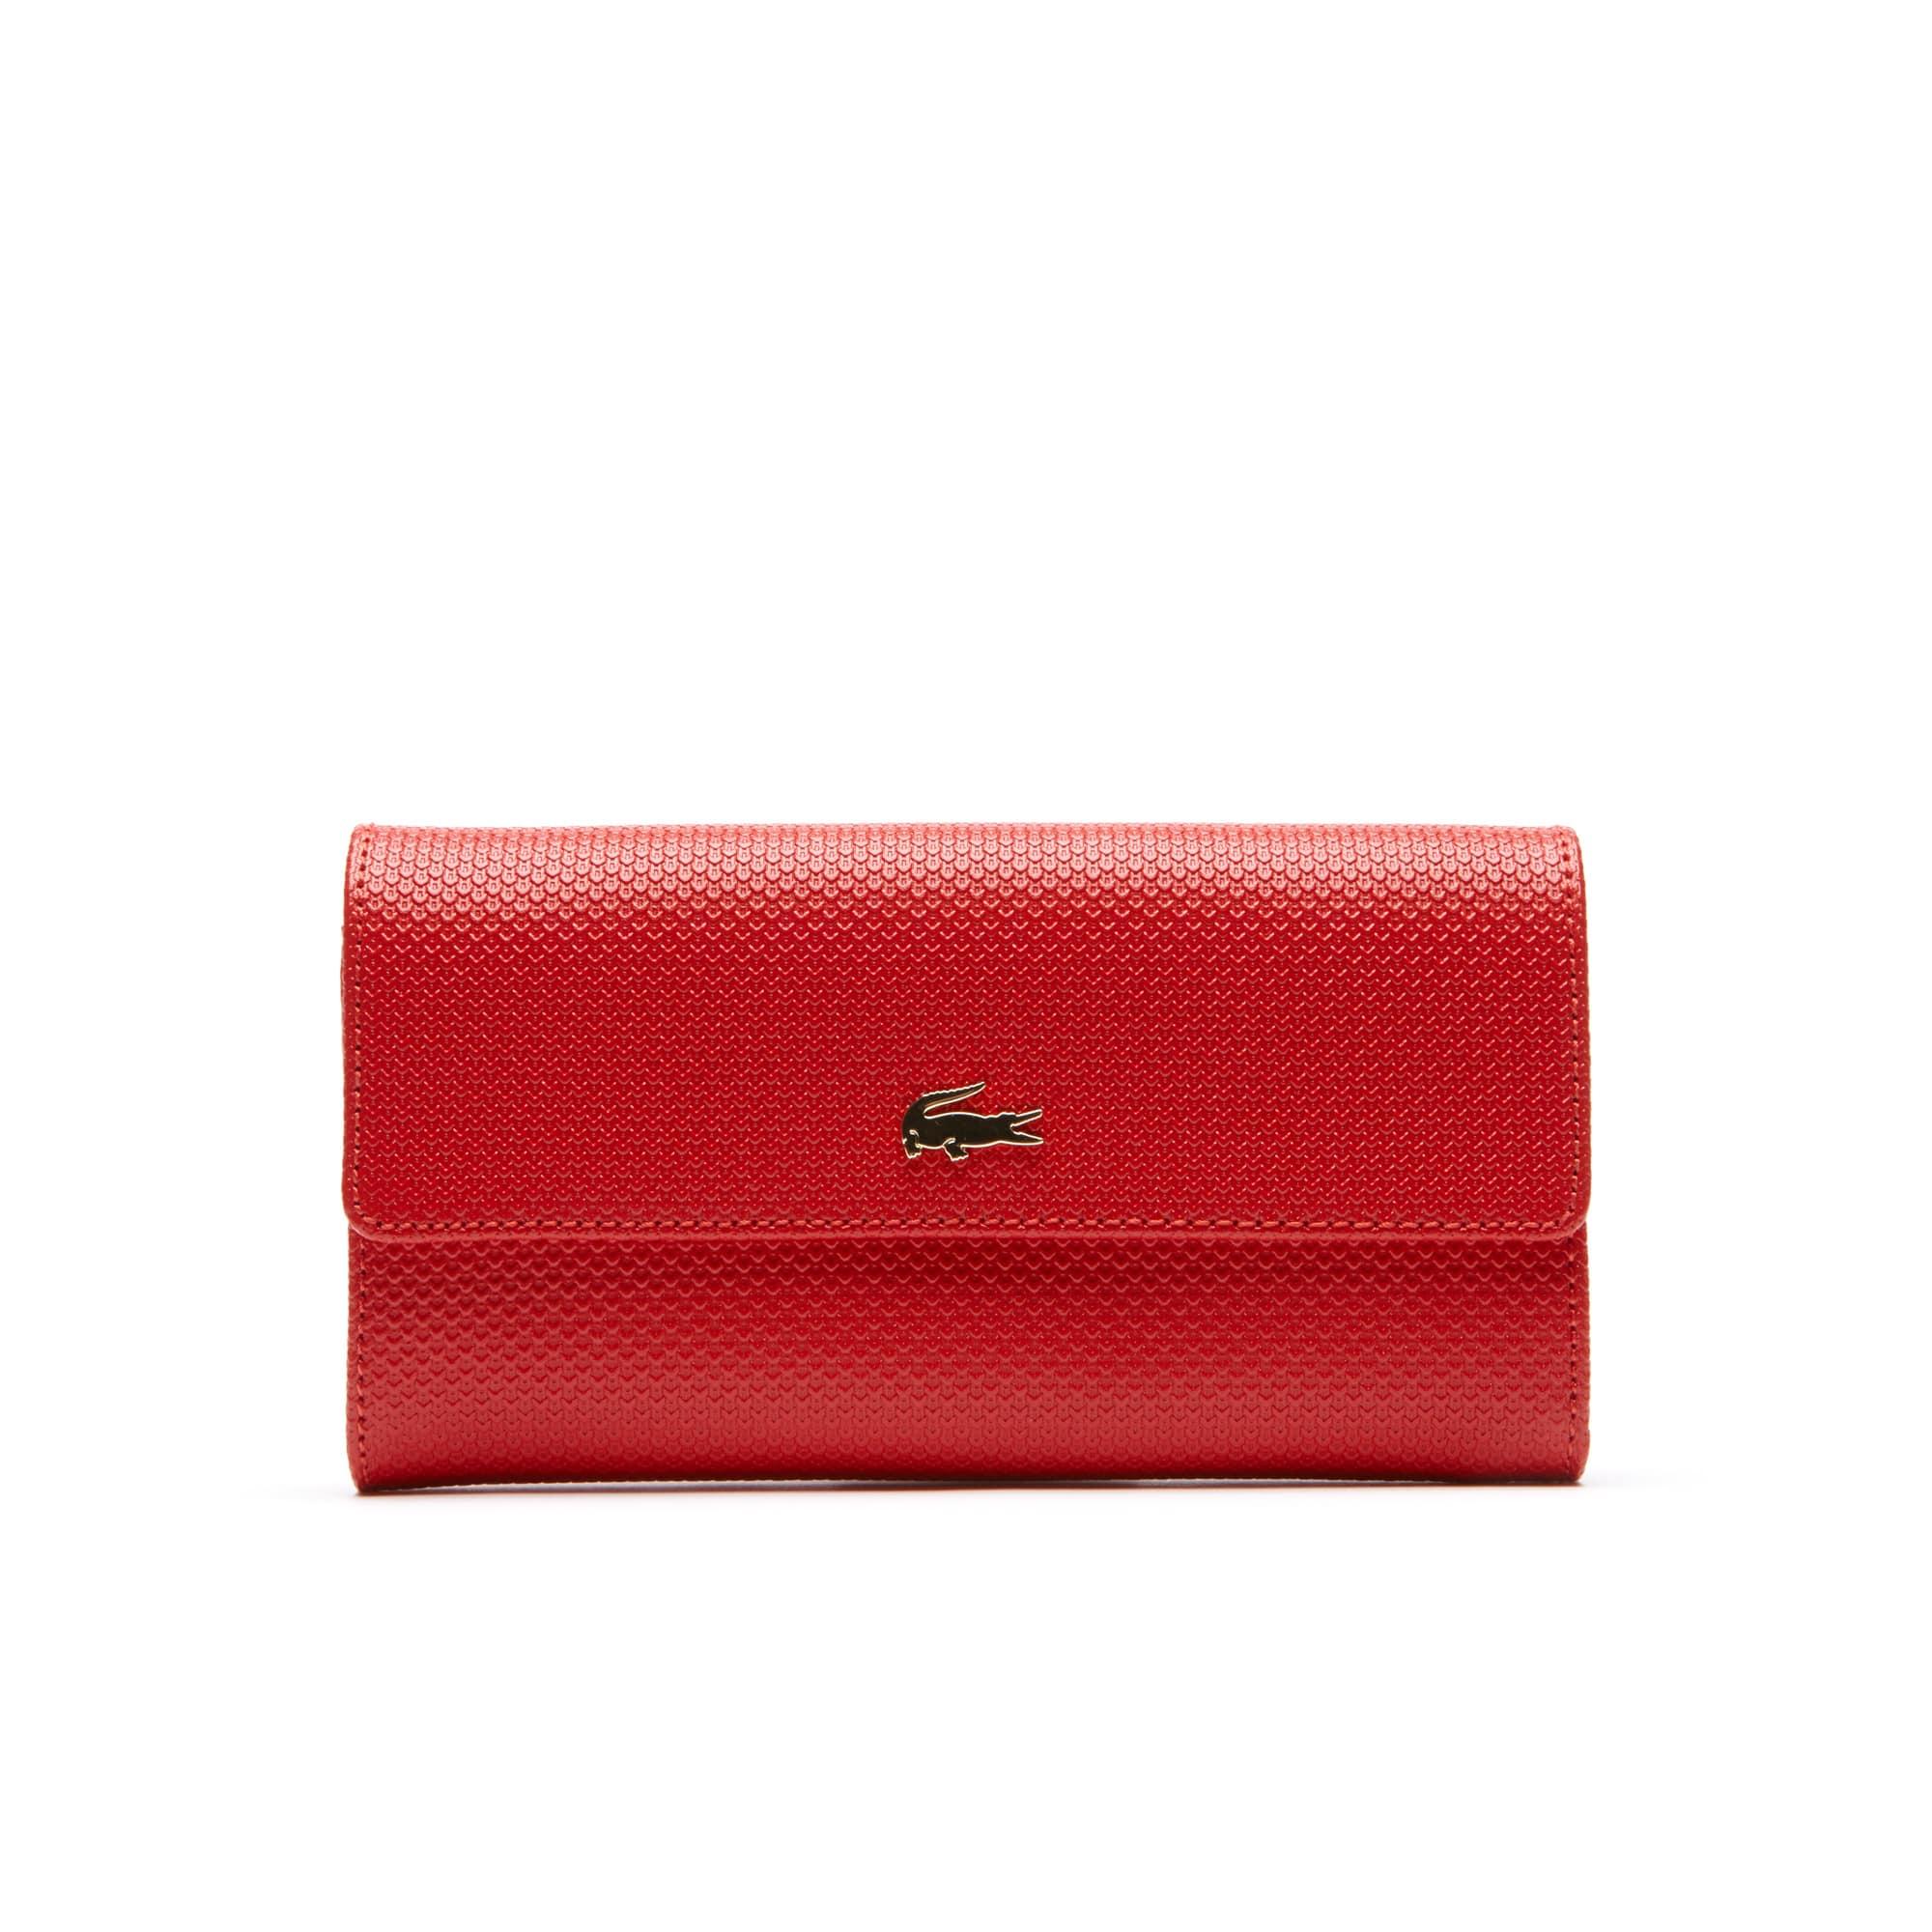 Women's Chantaco all-in-one wallet in leather